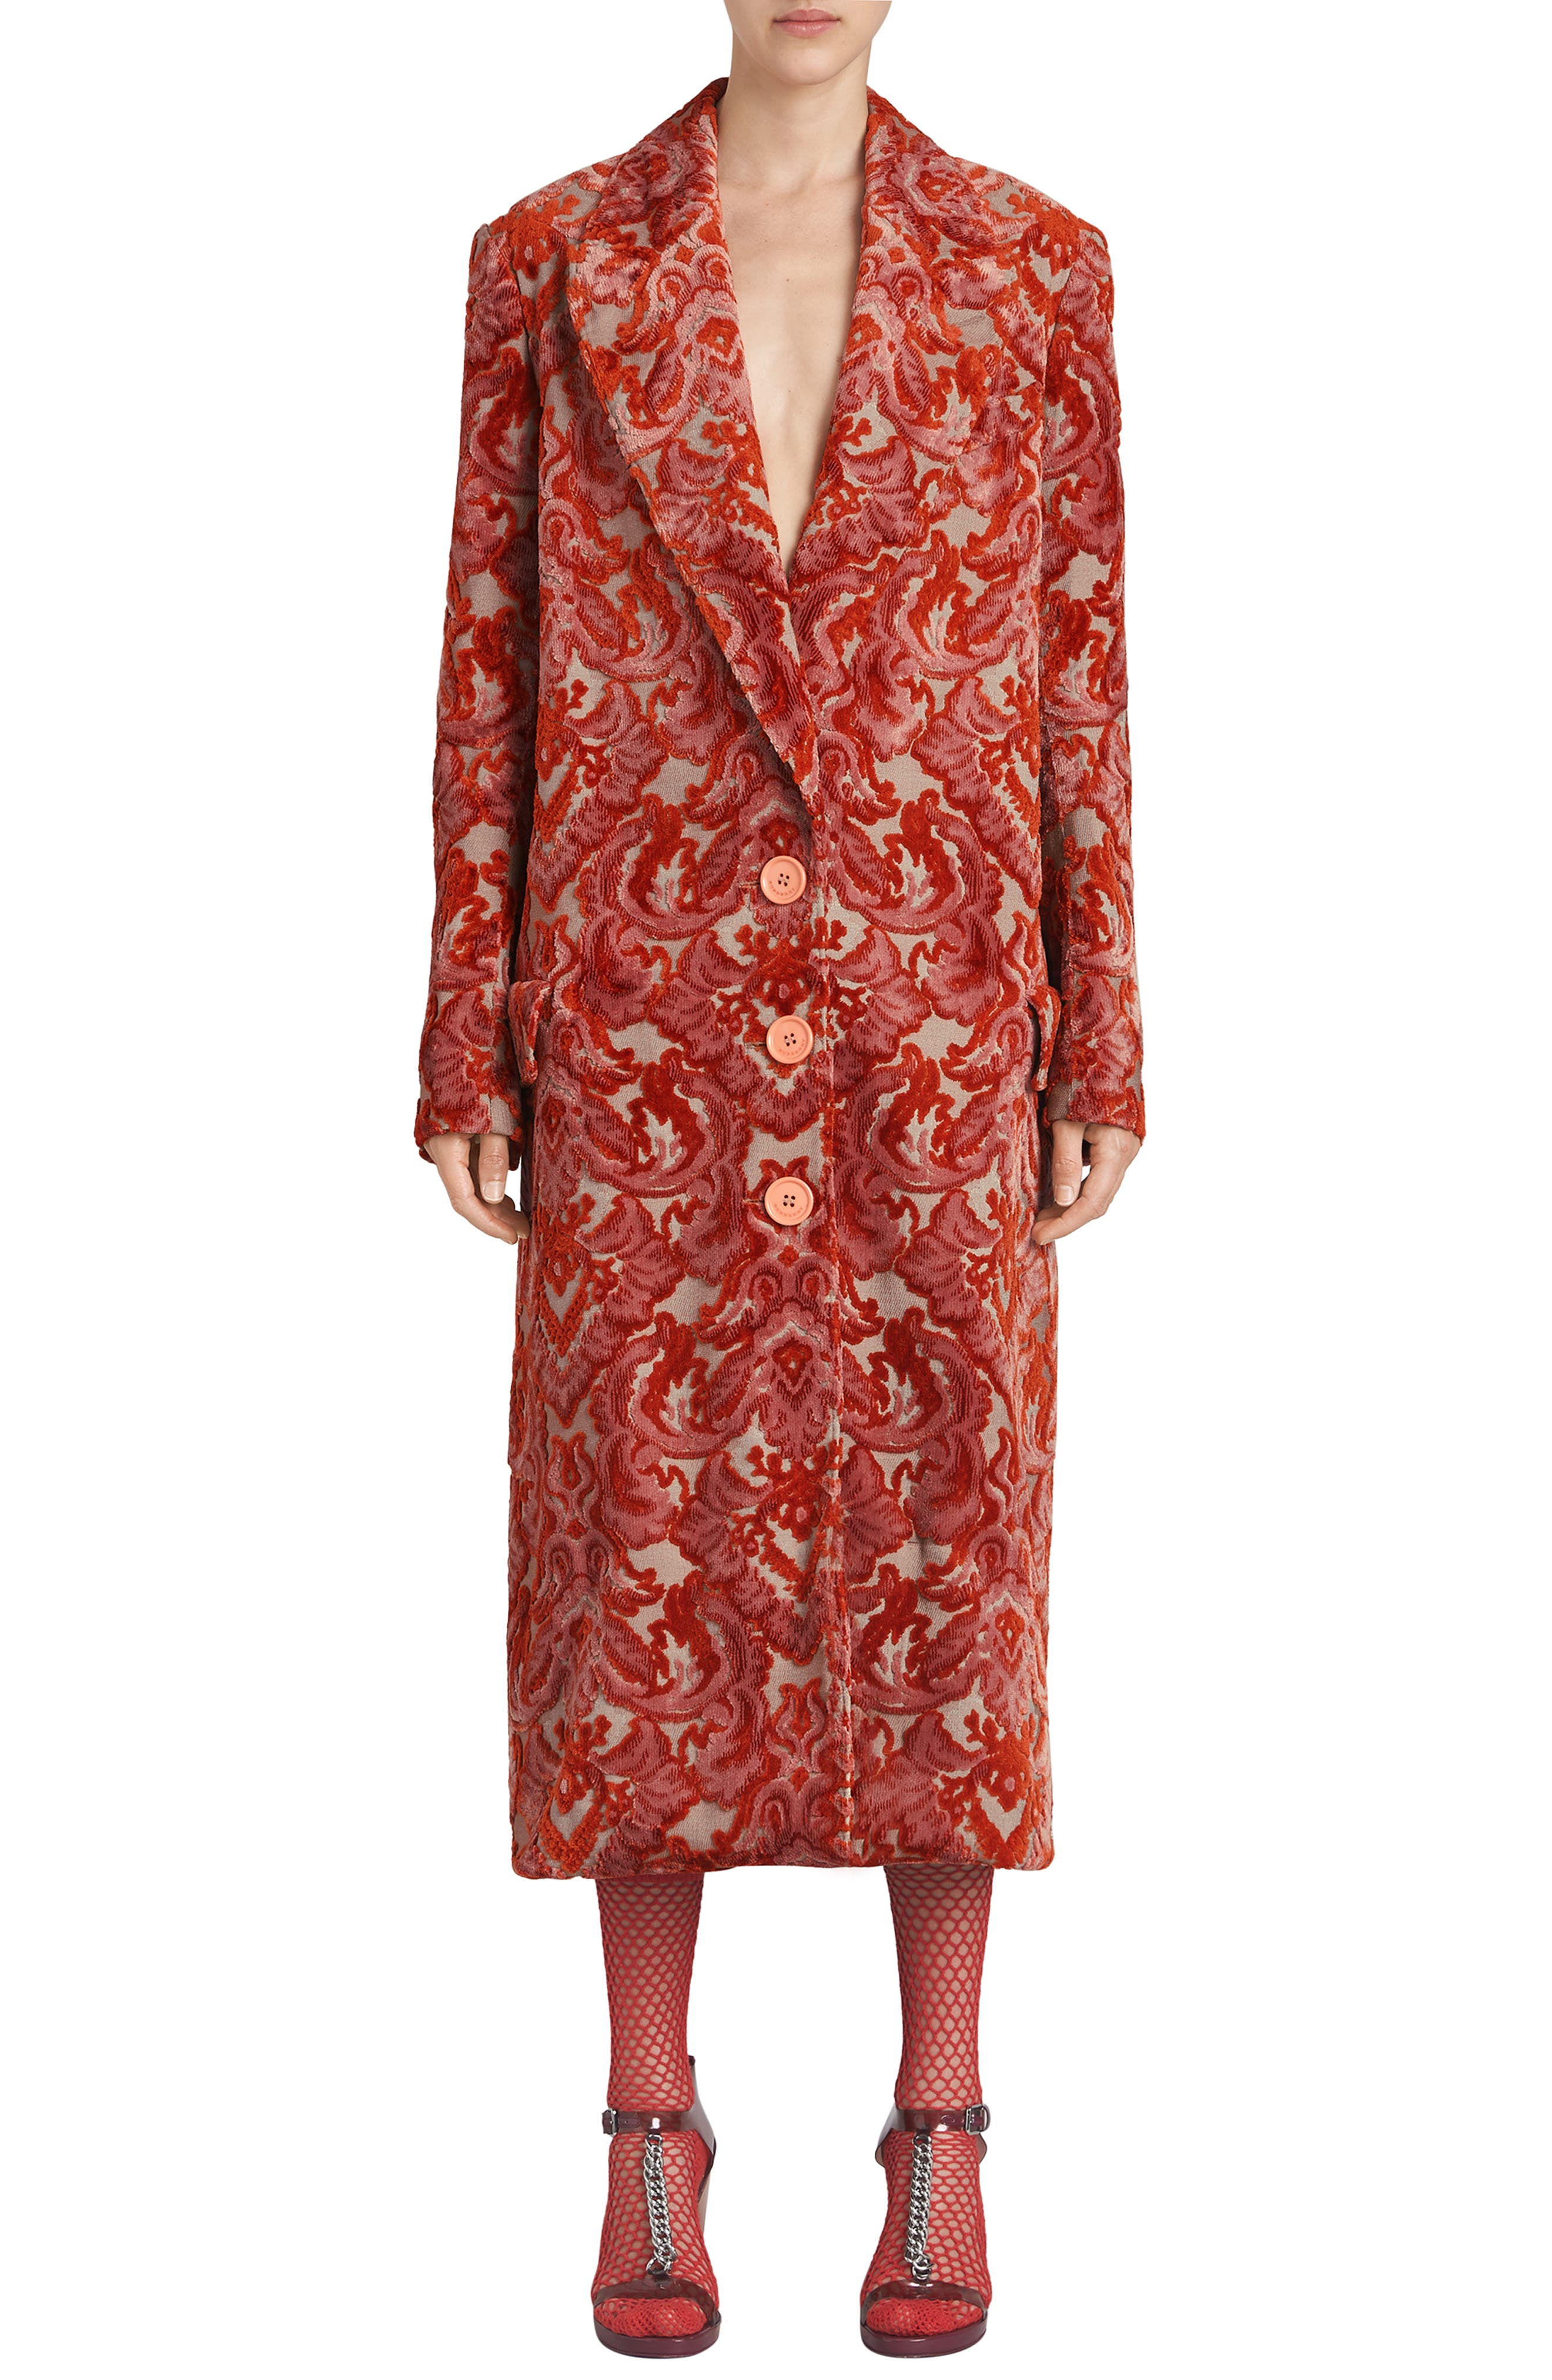 Burberry Dress On Sale